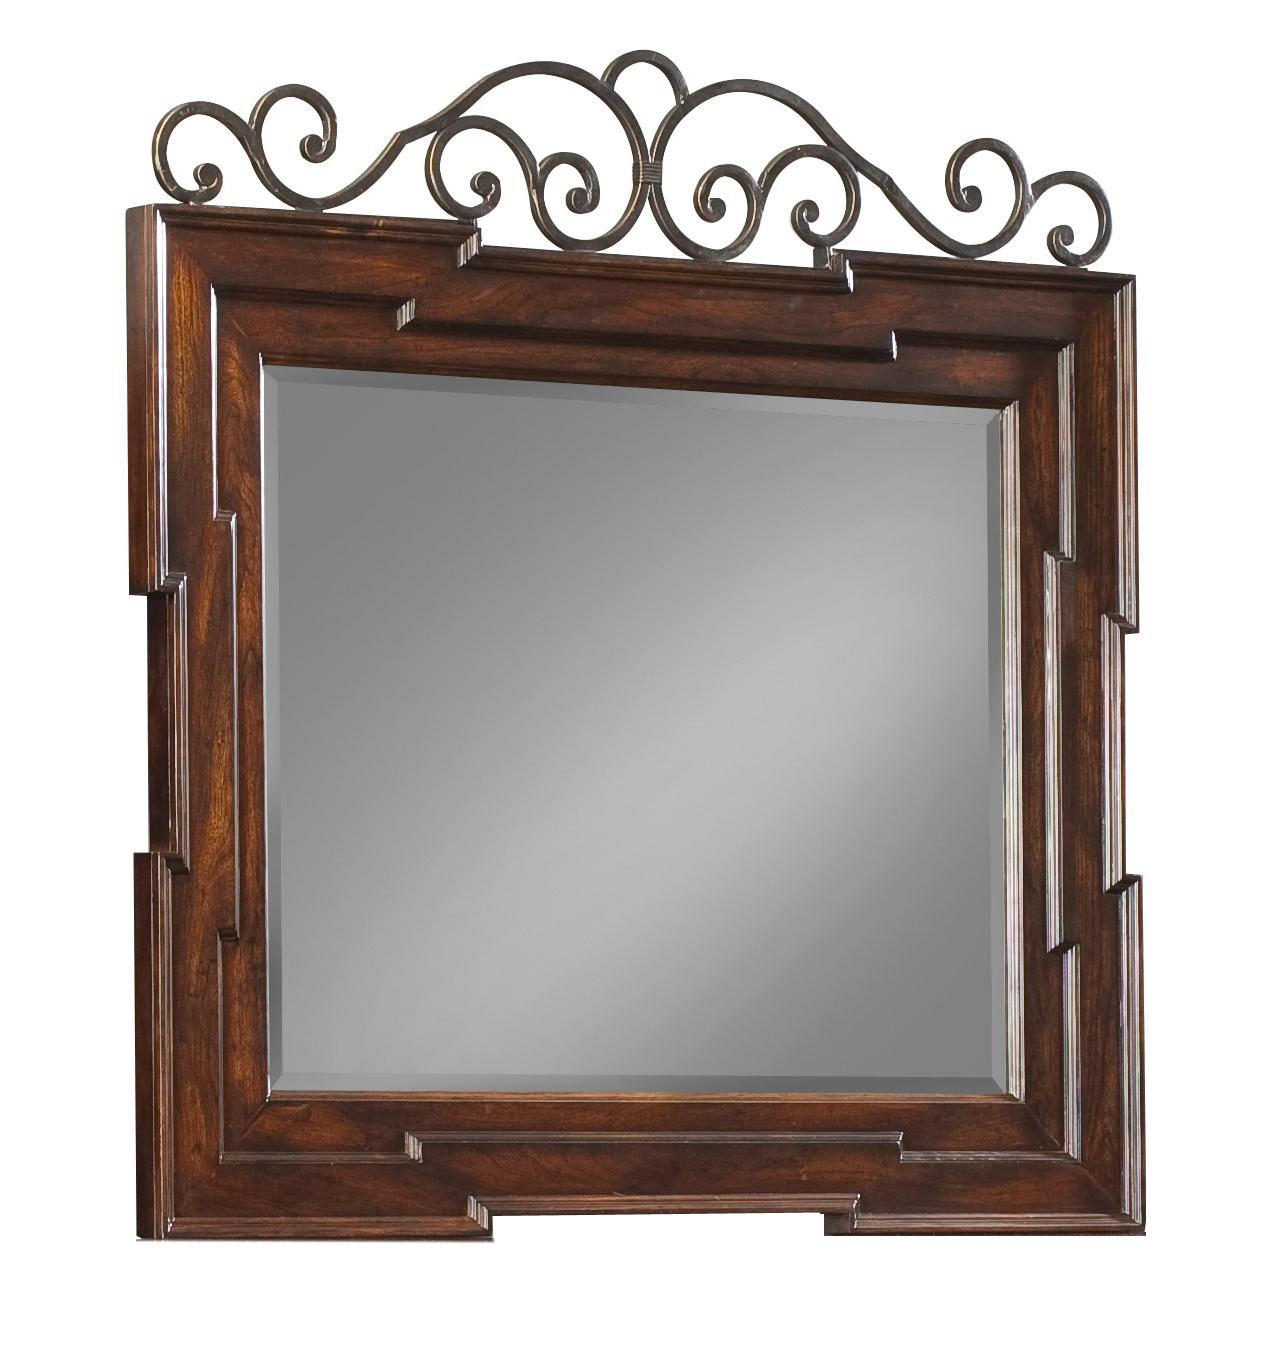 Belfort Basics Chesterbrook Mirror - Item Number: 872-660 MIRR